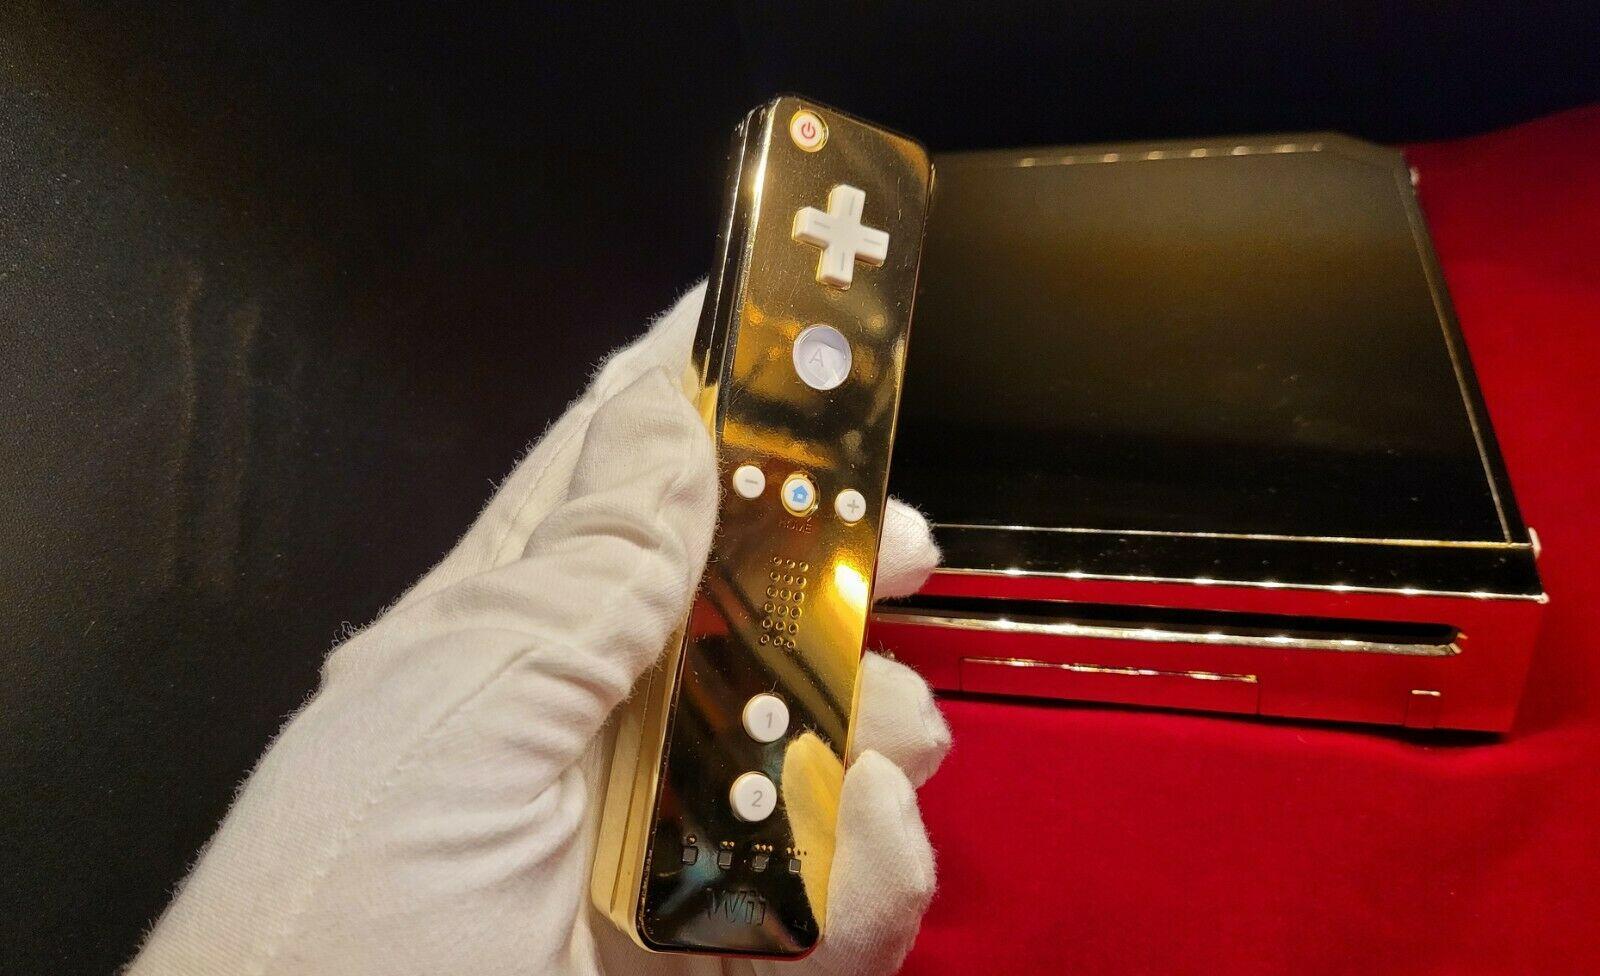 O Gold Nintendo Wii Queen Elizabeth II vai a leilão